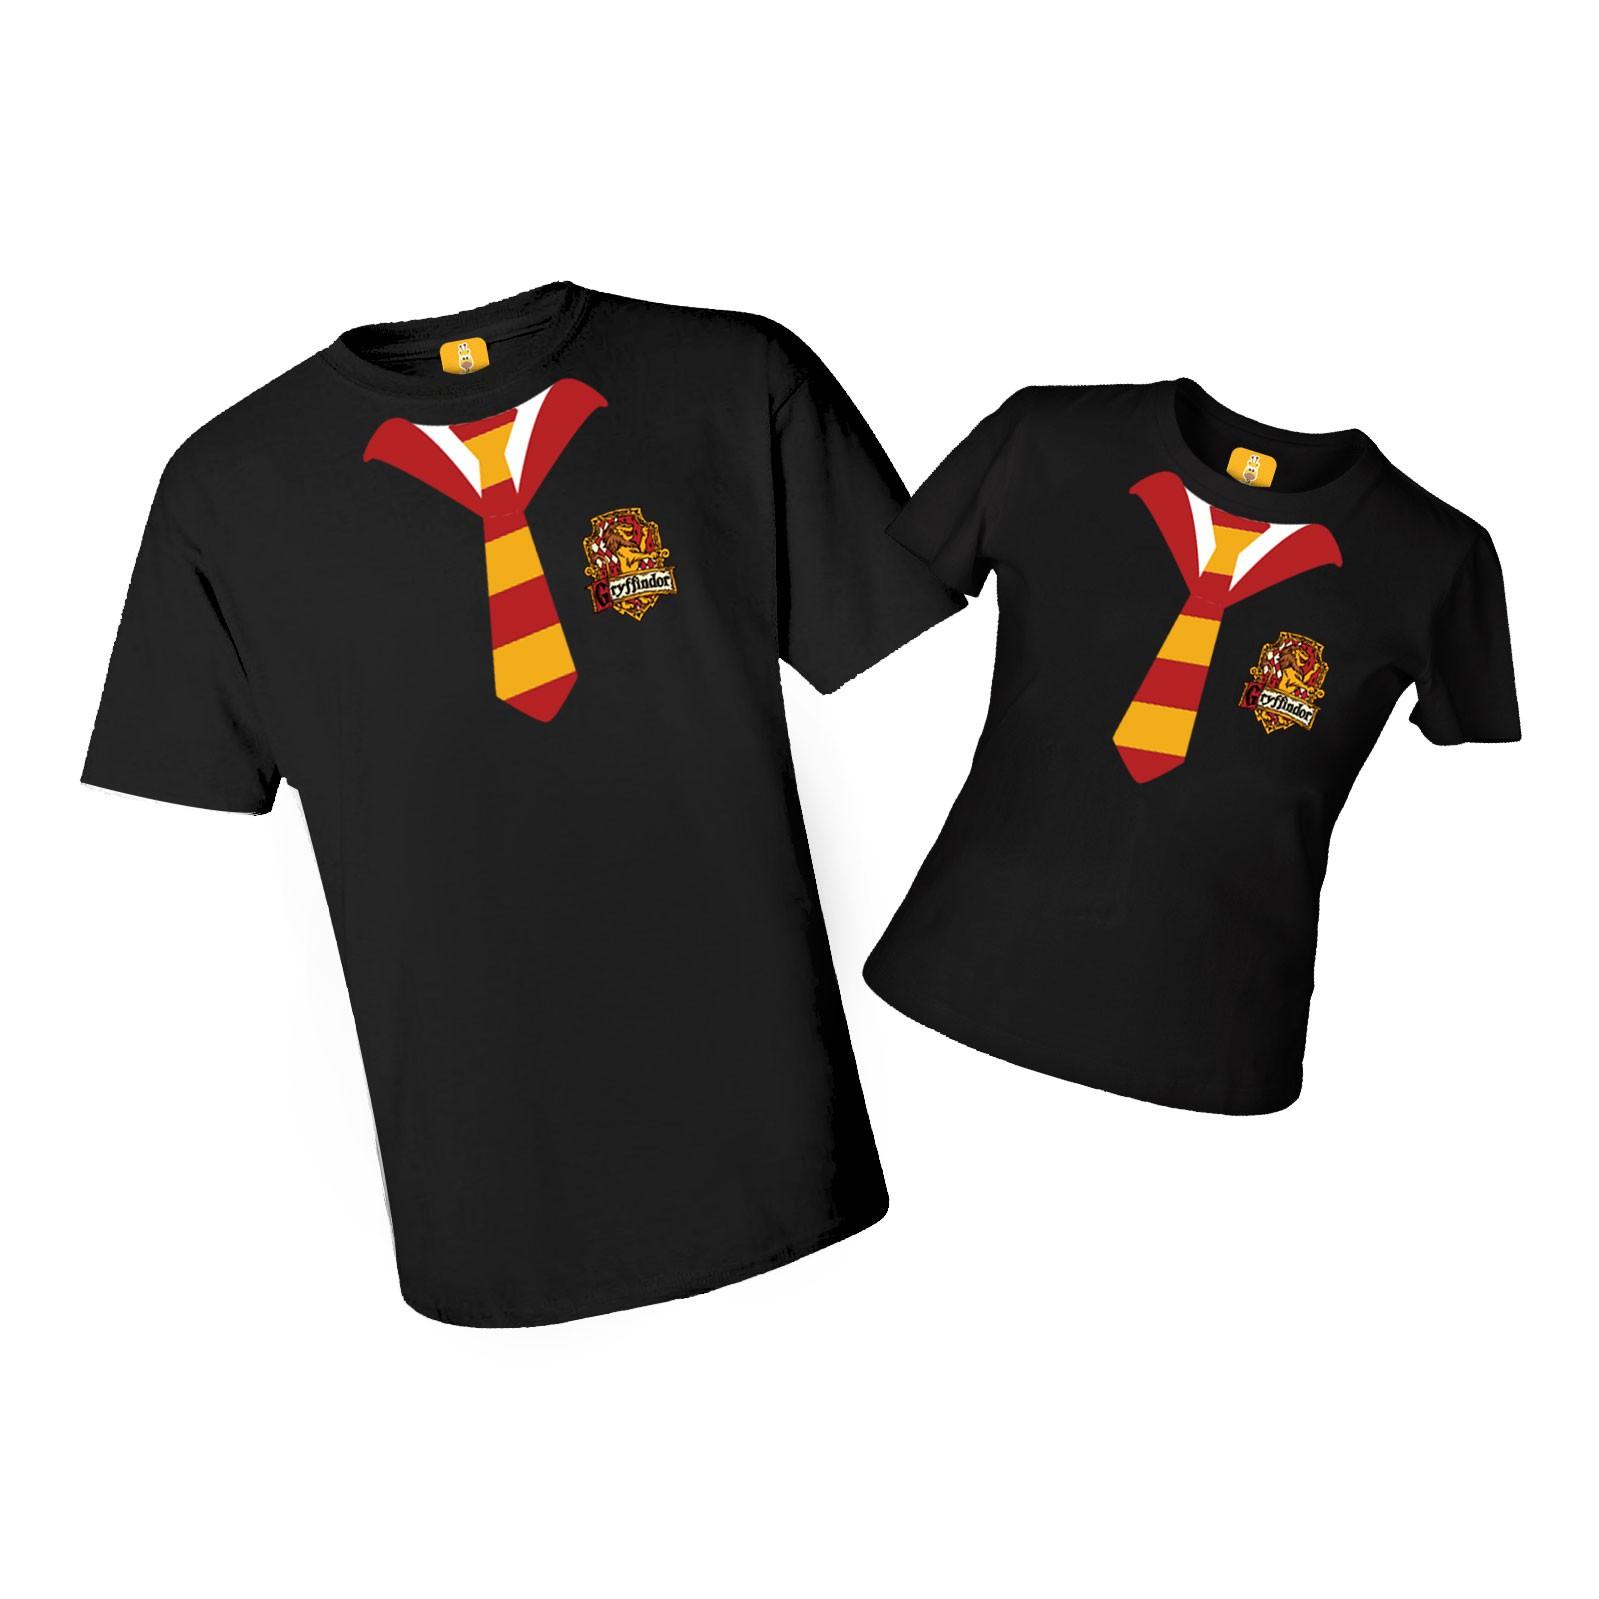 Camiseta adulta Harry Potter com 2 peças